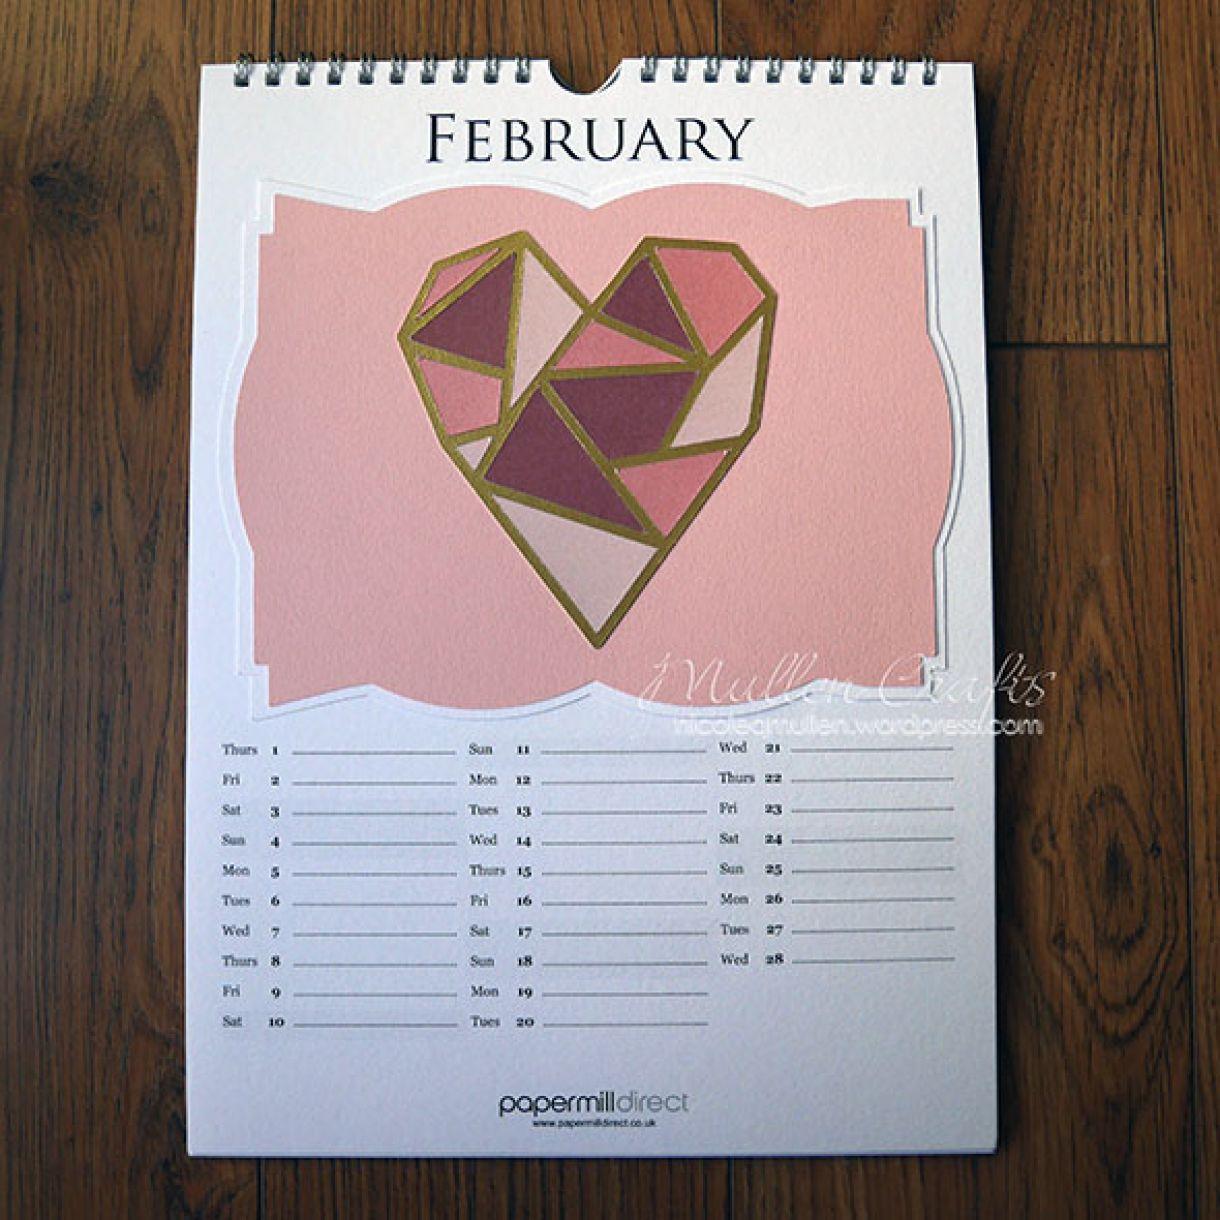 Nicole 2018 Calendar February1